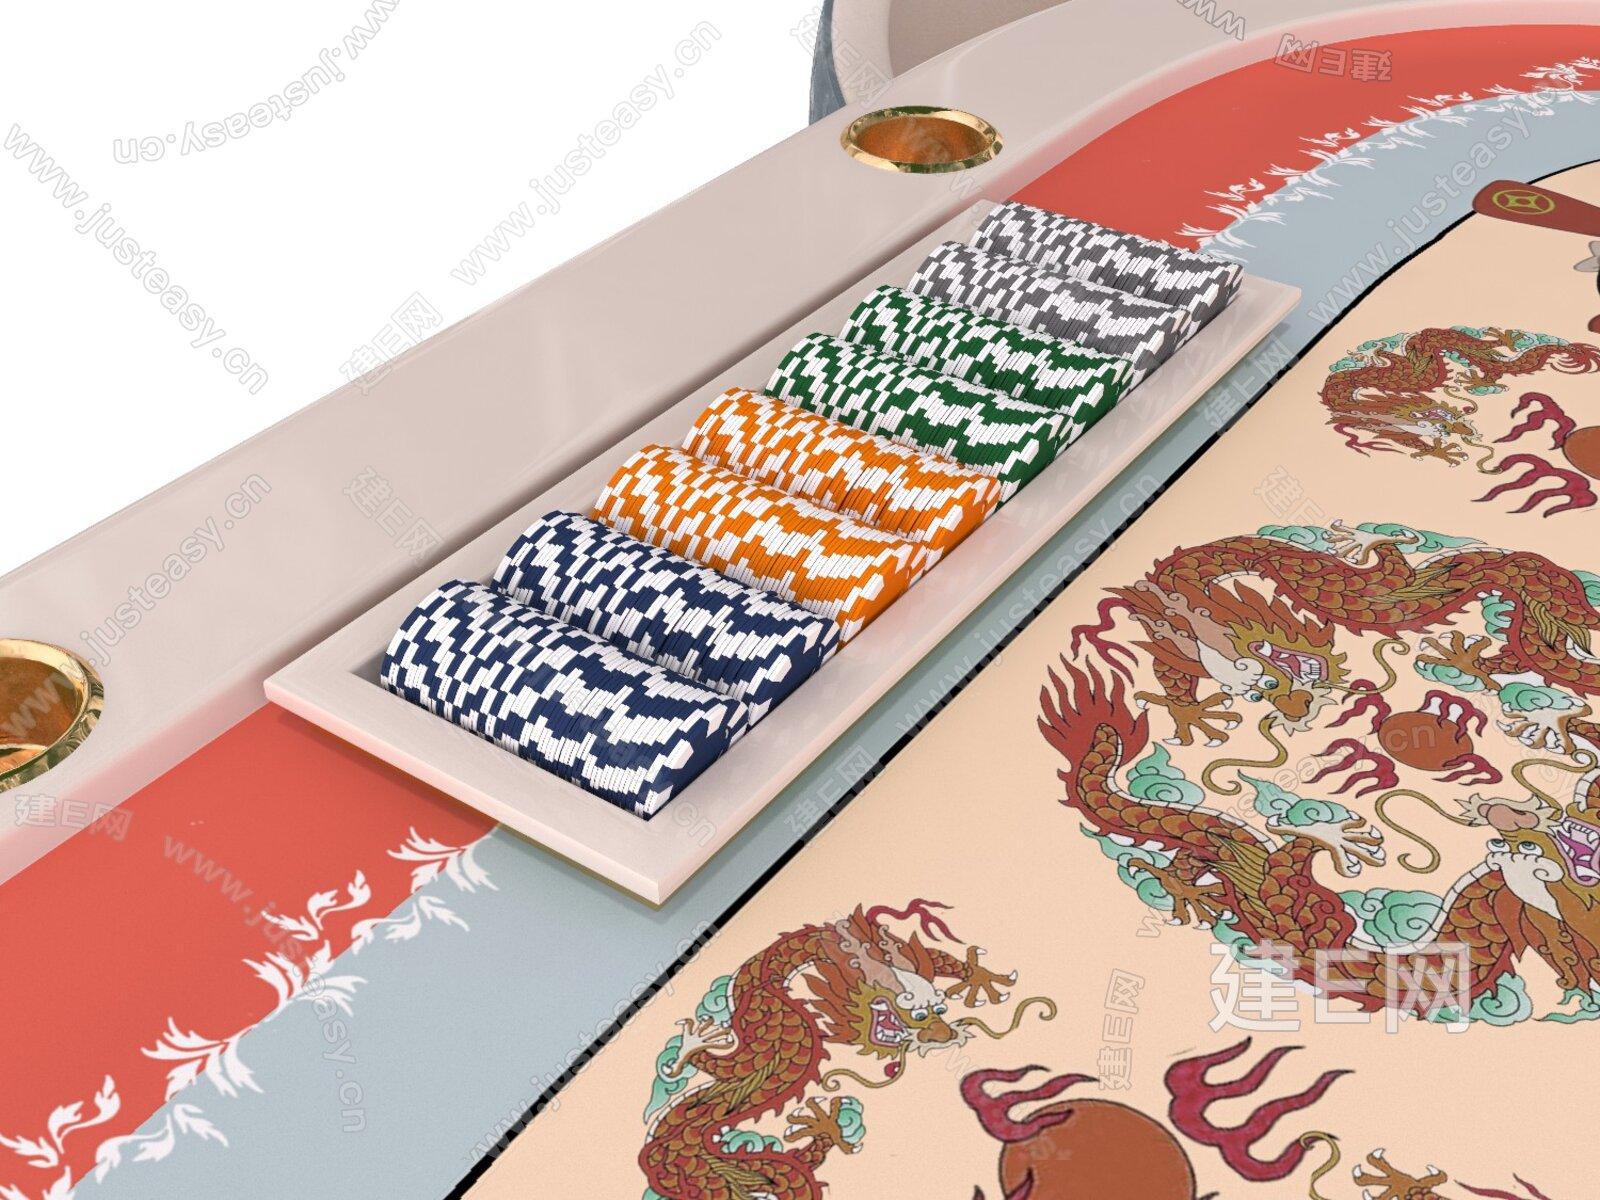 VISMARA DESIGN 现代棋牌桌椅组合3d模型